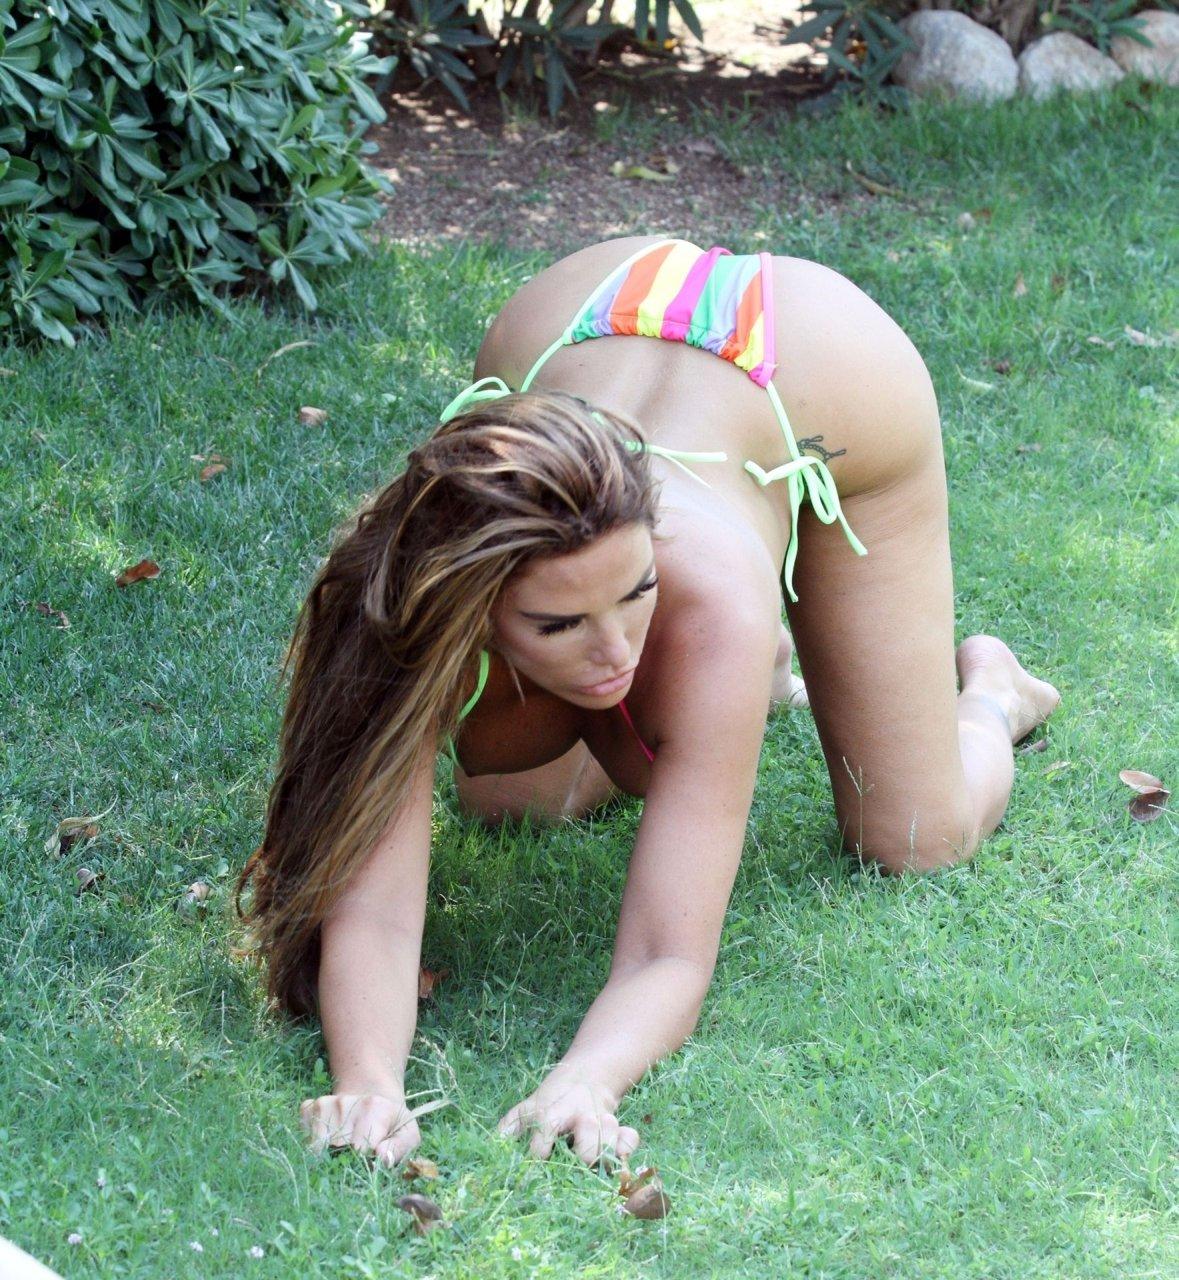 Katie-Price-Nude-Sexy-TheFappeningBlog.com-77.jpg